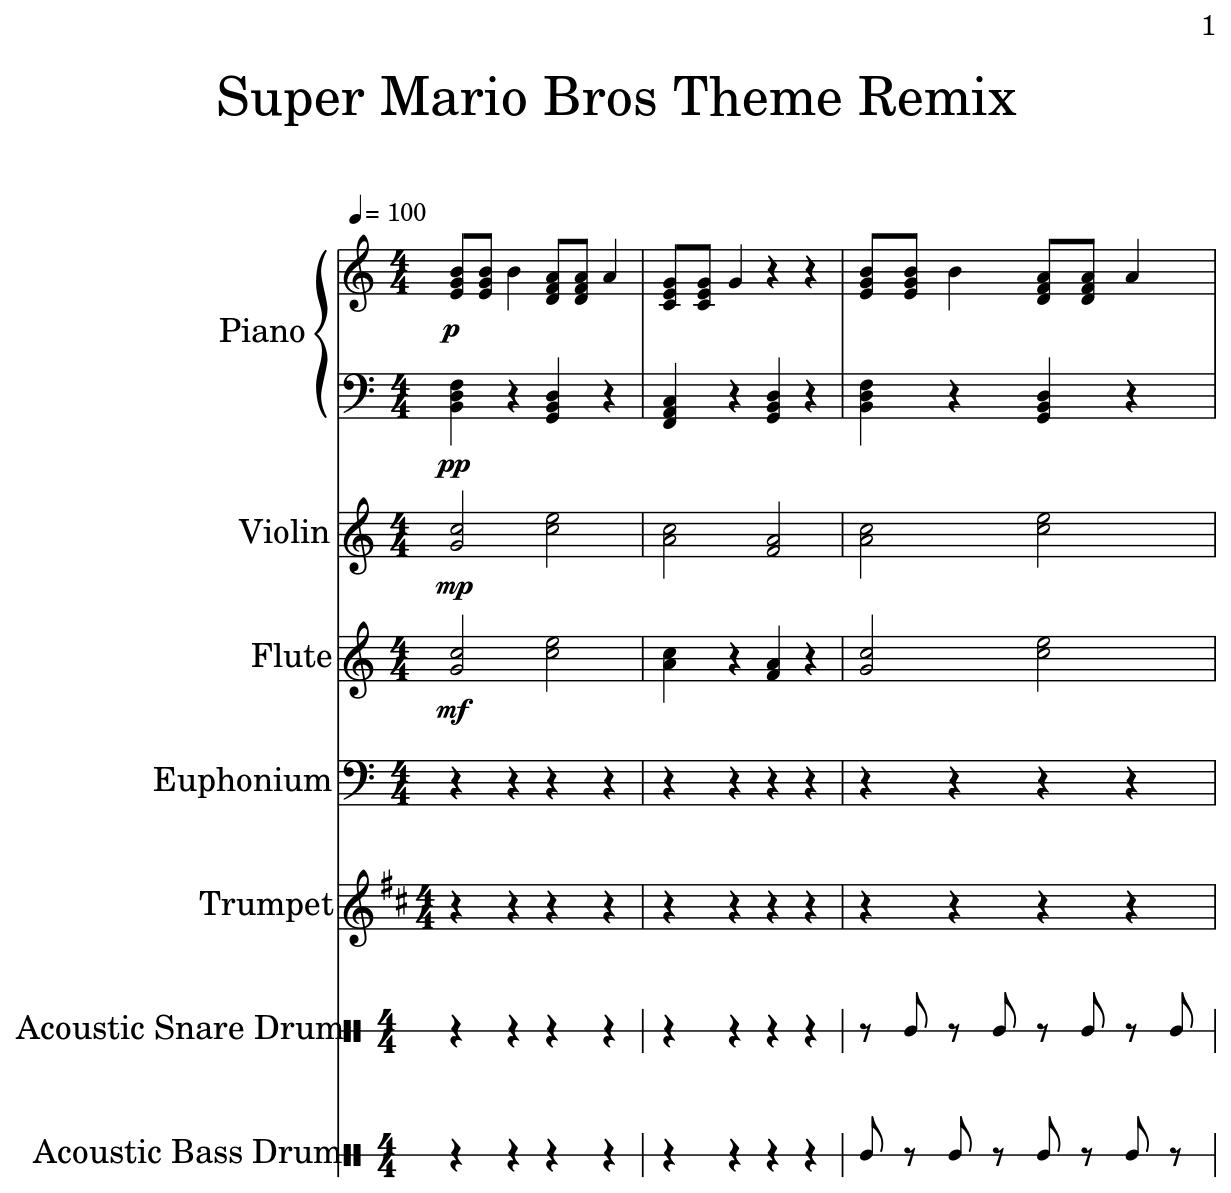 Super Mario Bros Theme Remix - Flat